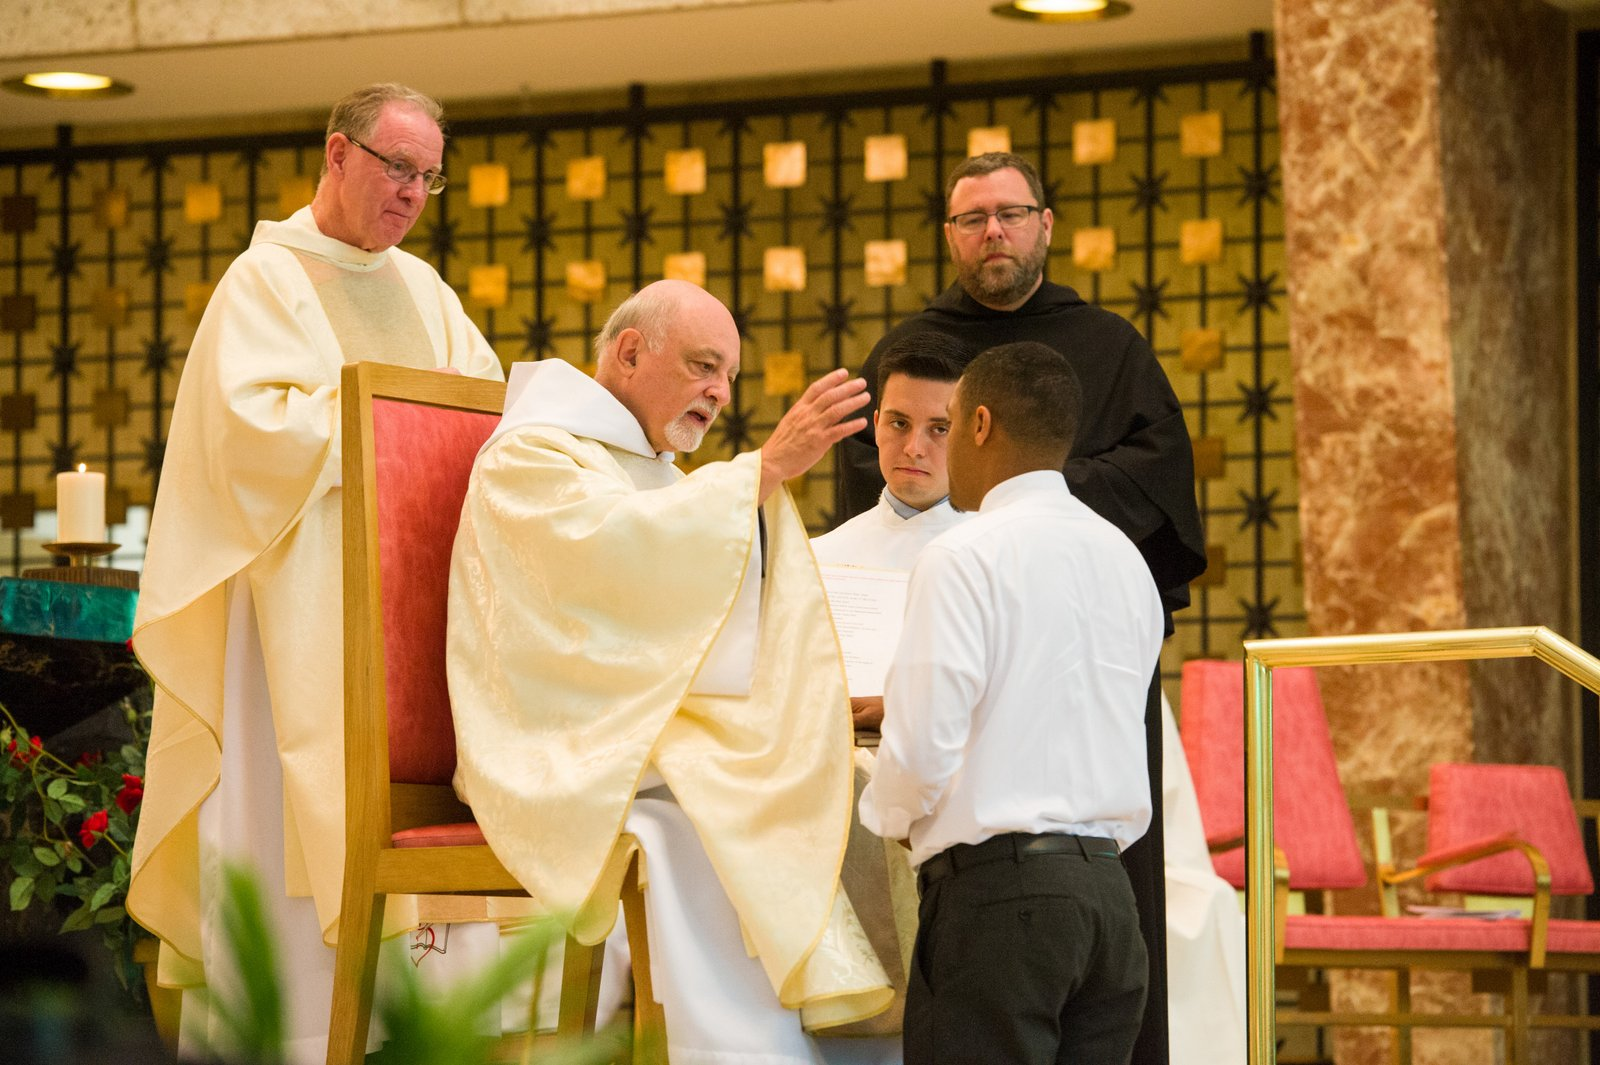 Elizandro Contreras professes his first vows